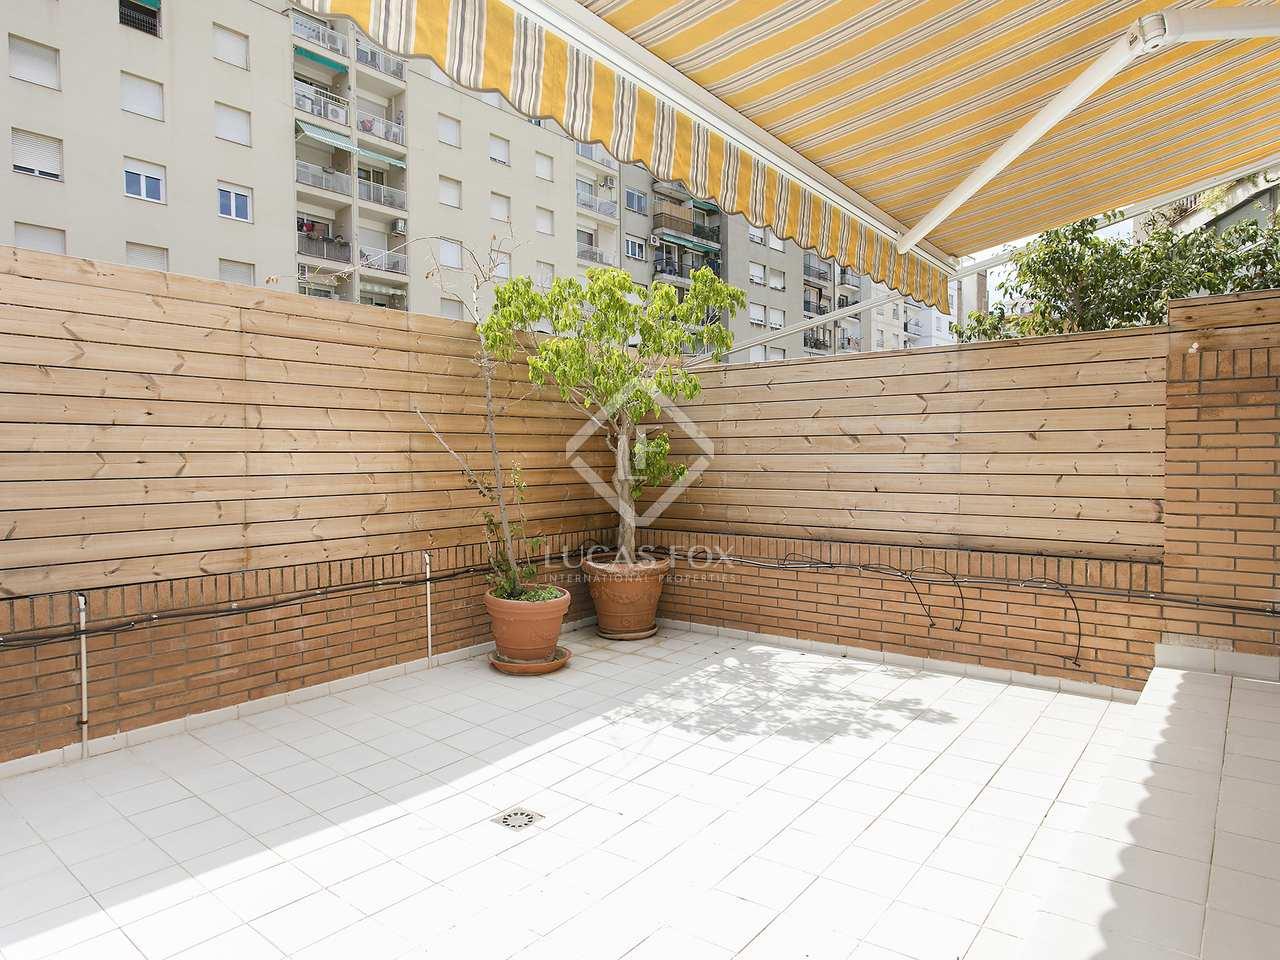 Casa de 145 m con 55 m de terrazas en alquiler en les corts for Casa con jardin alquiler barcelona